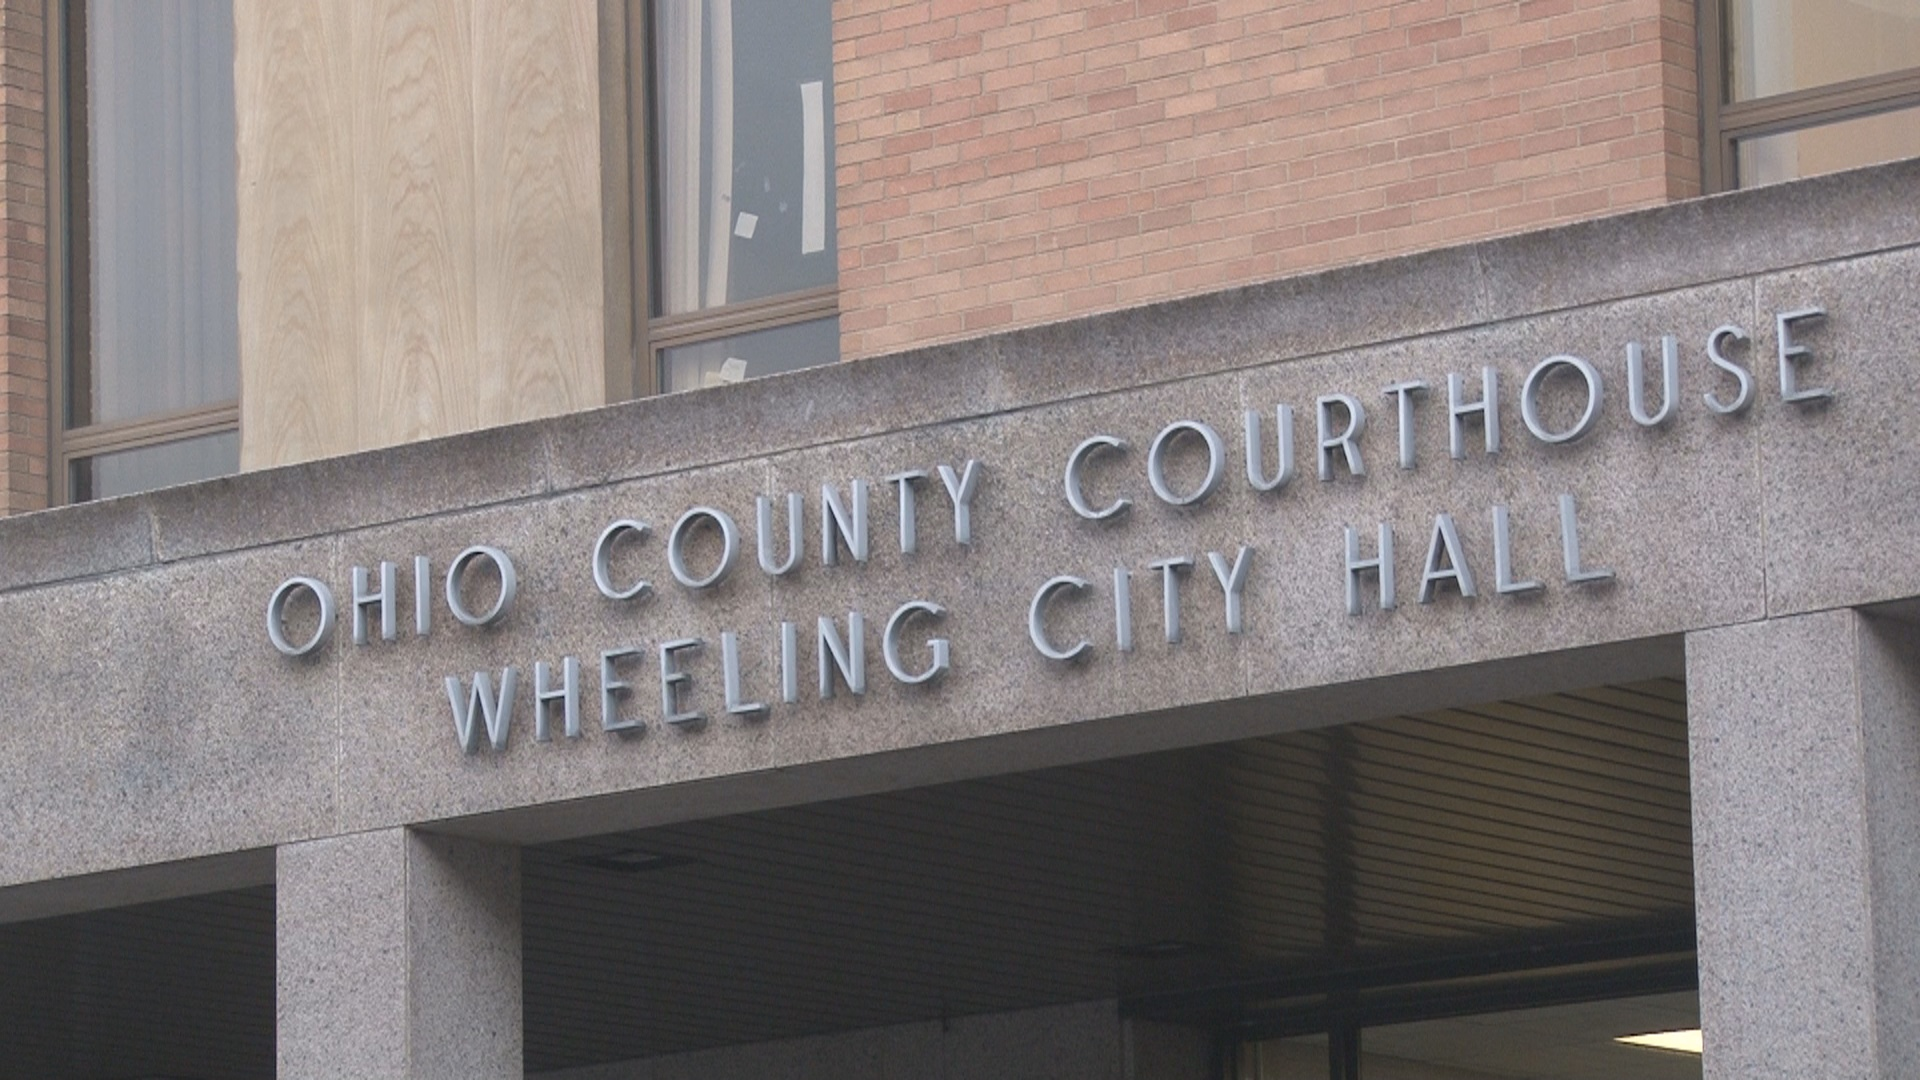 Wheeling City Council Building_1520474183503.jpg